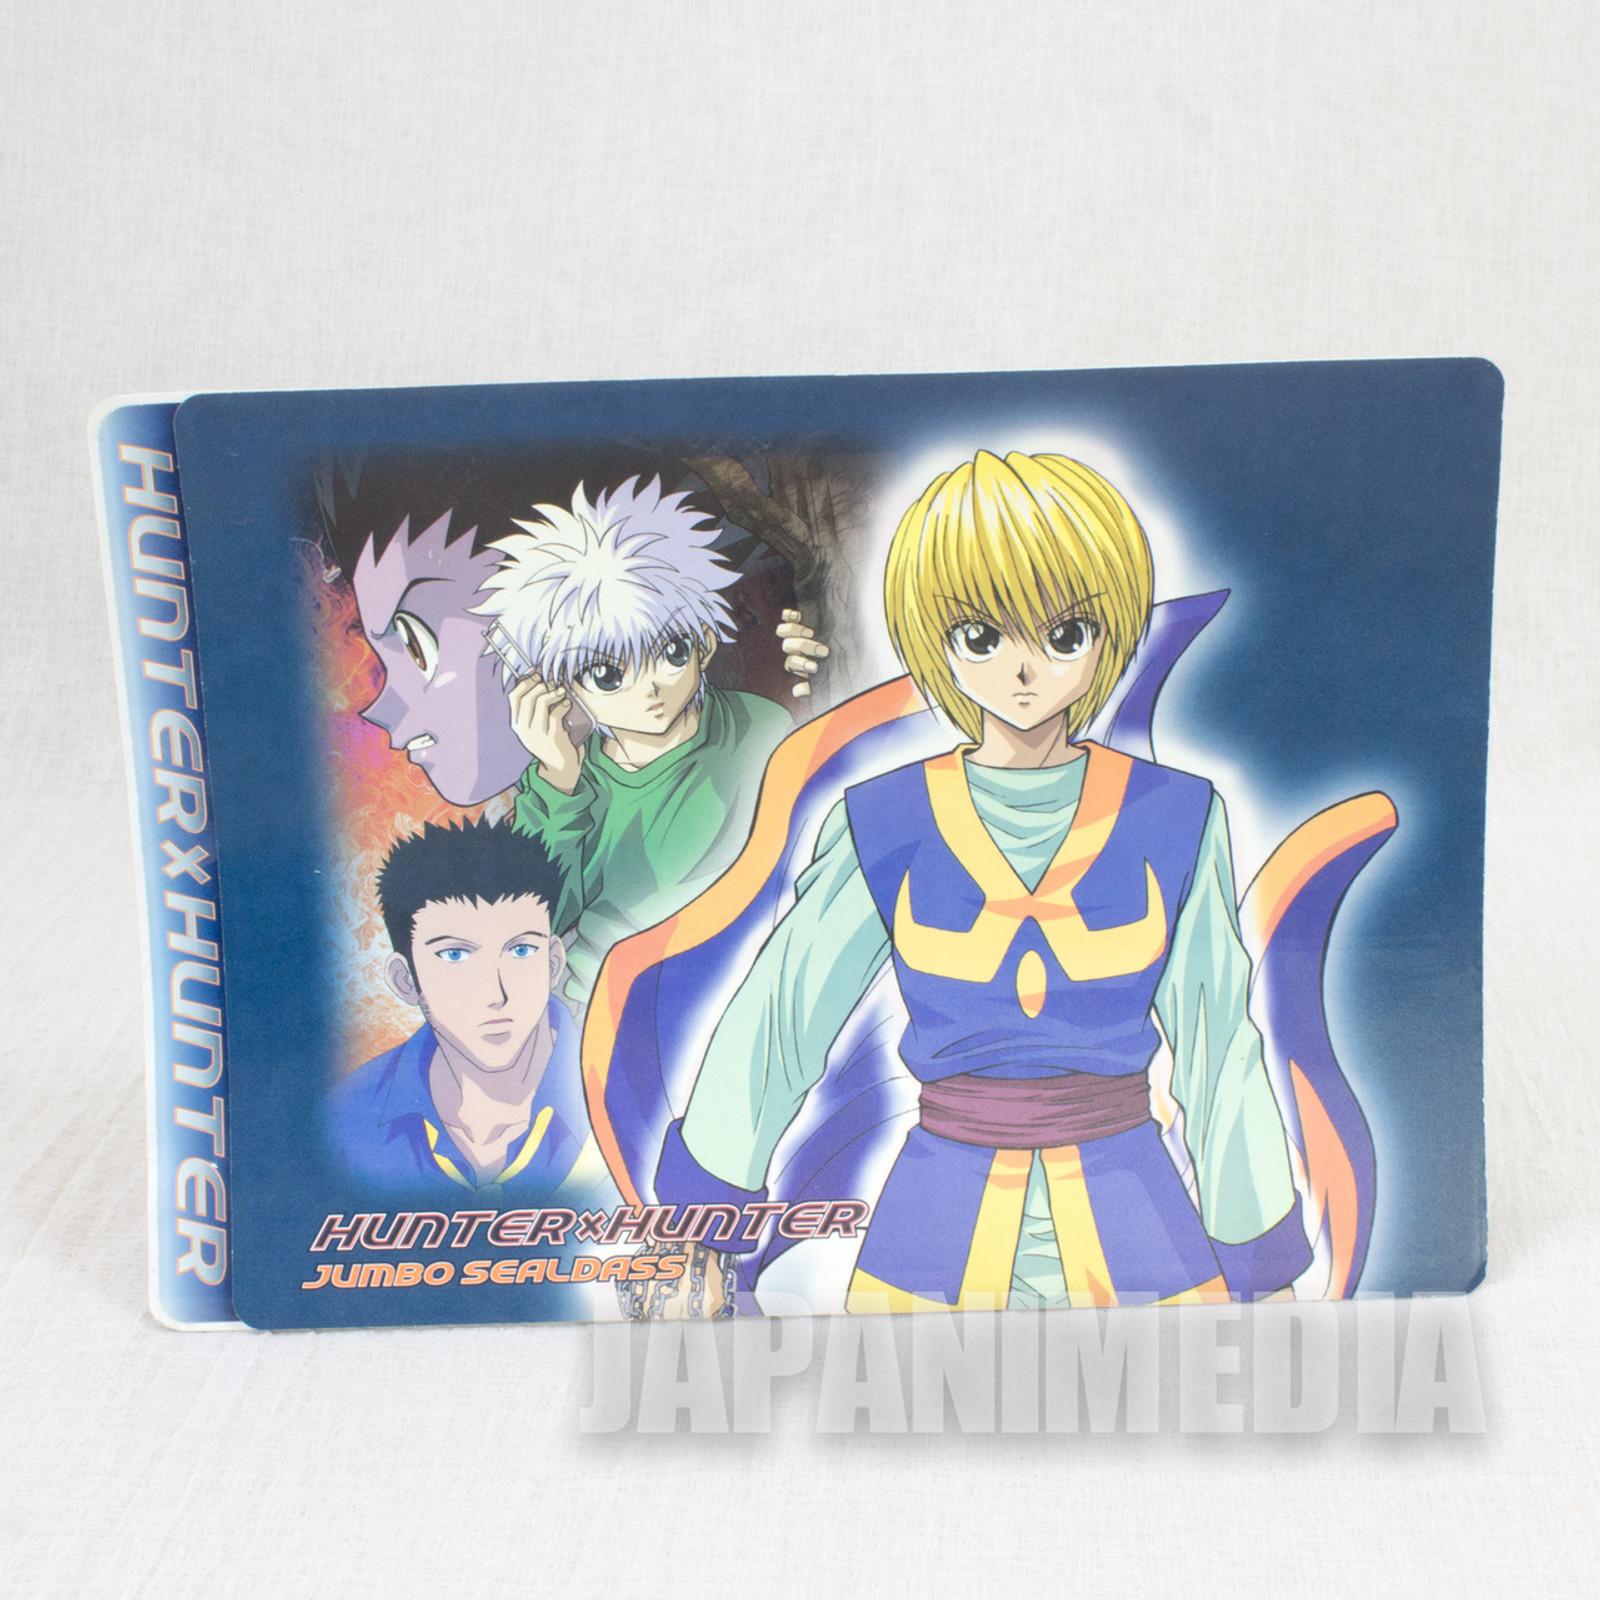 HUNTER x HUNTER Jumbo Sealdass Sticker Kurapika ver. BANDAI 2001 JAPAN ANIME MANGA